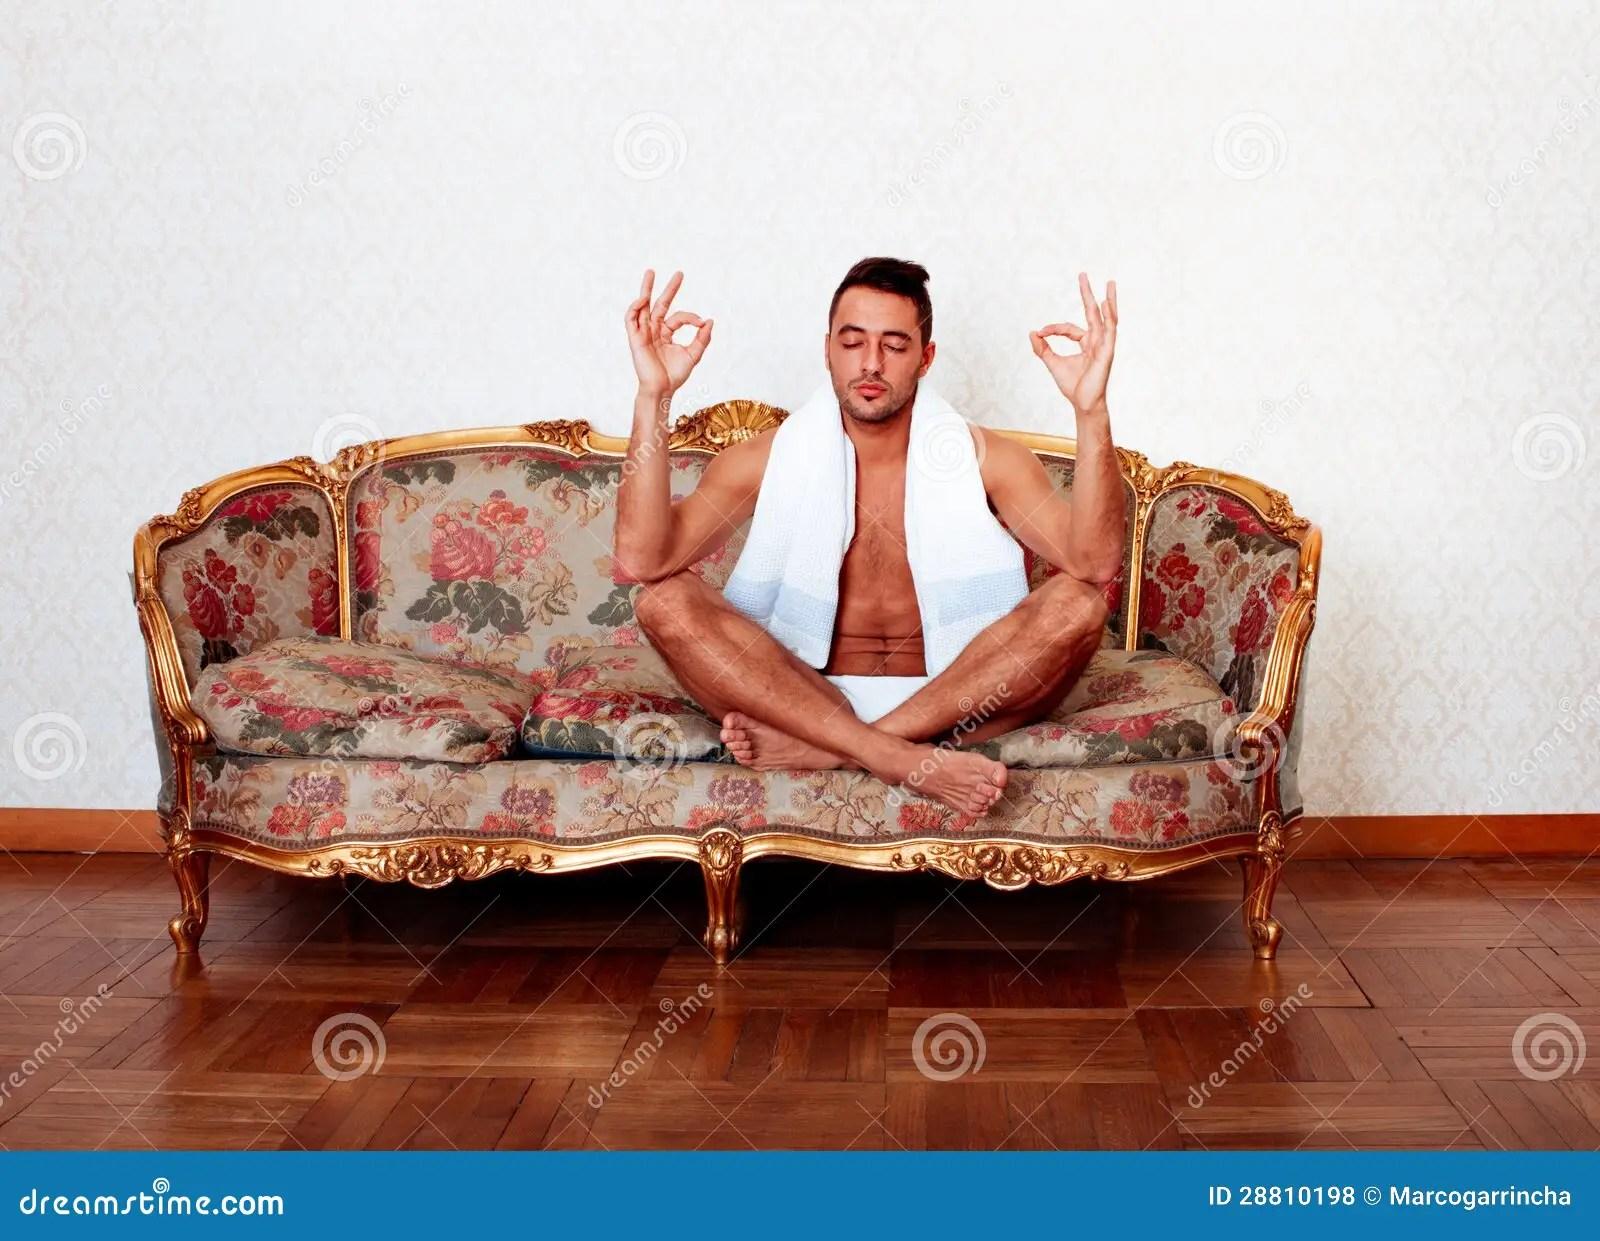 yoga sofa throws argos man undressed on stock photo image of room